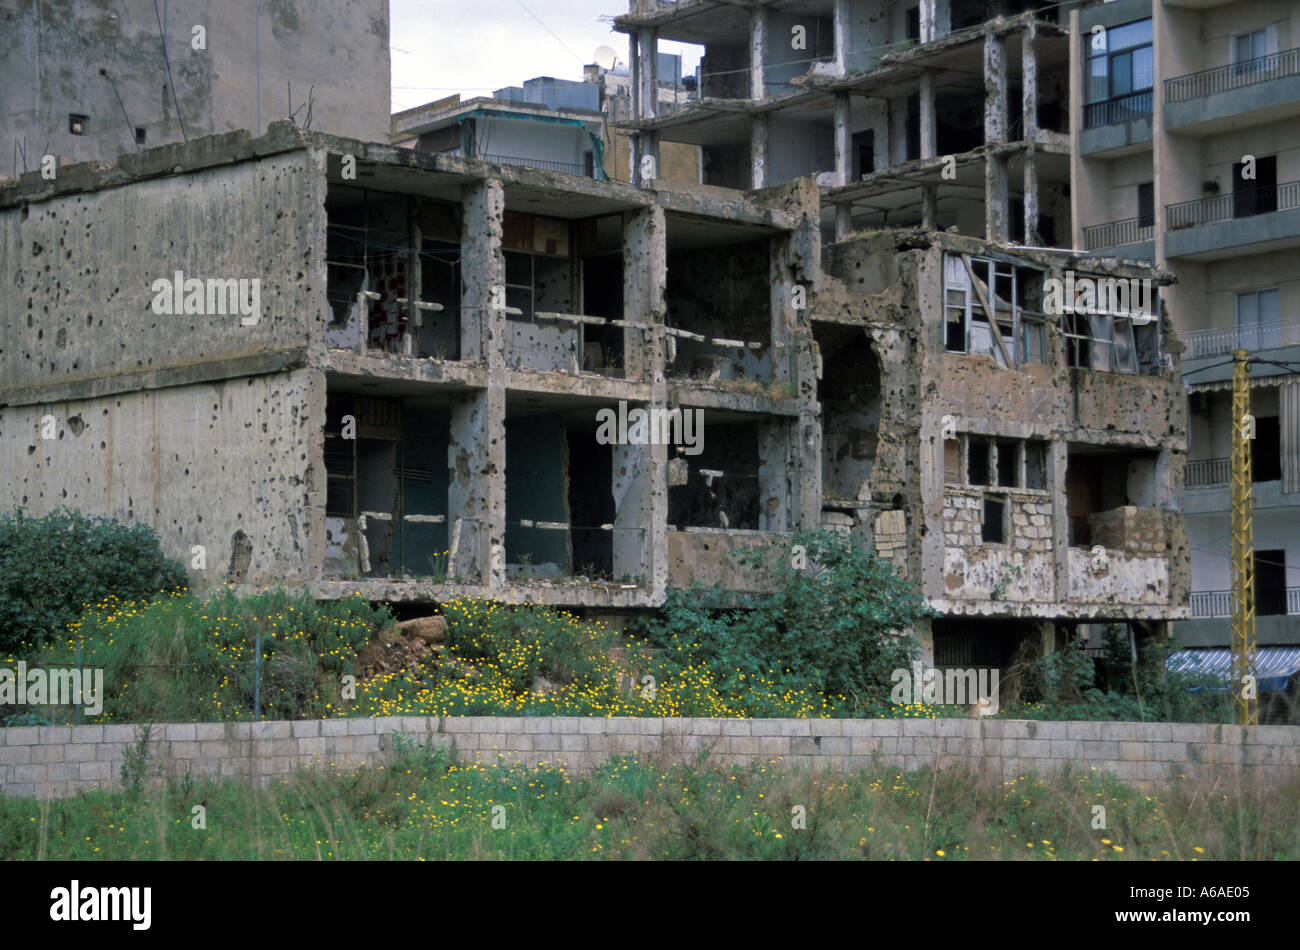 Lebanon Beirut War ruins - Stock Image